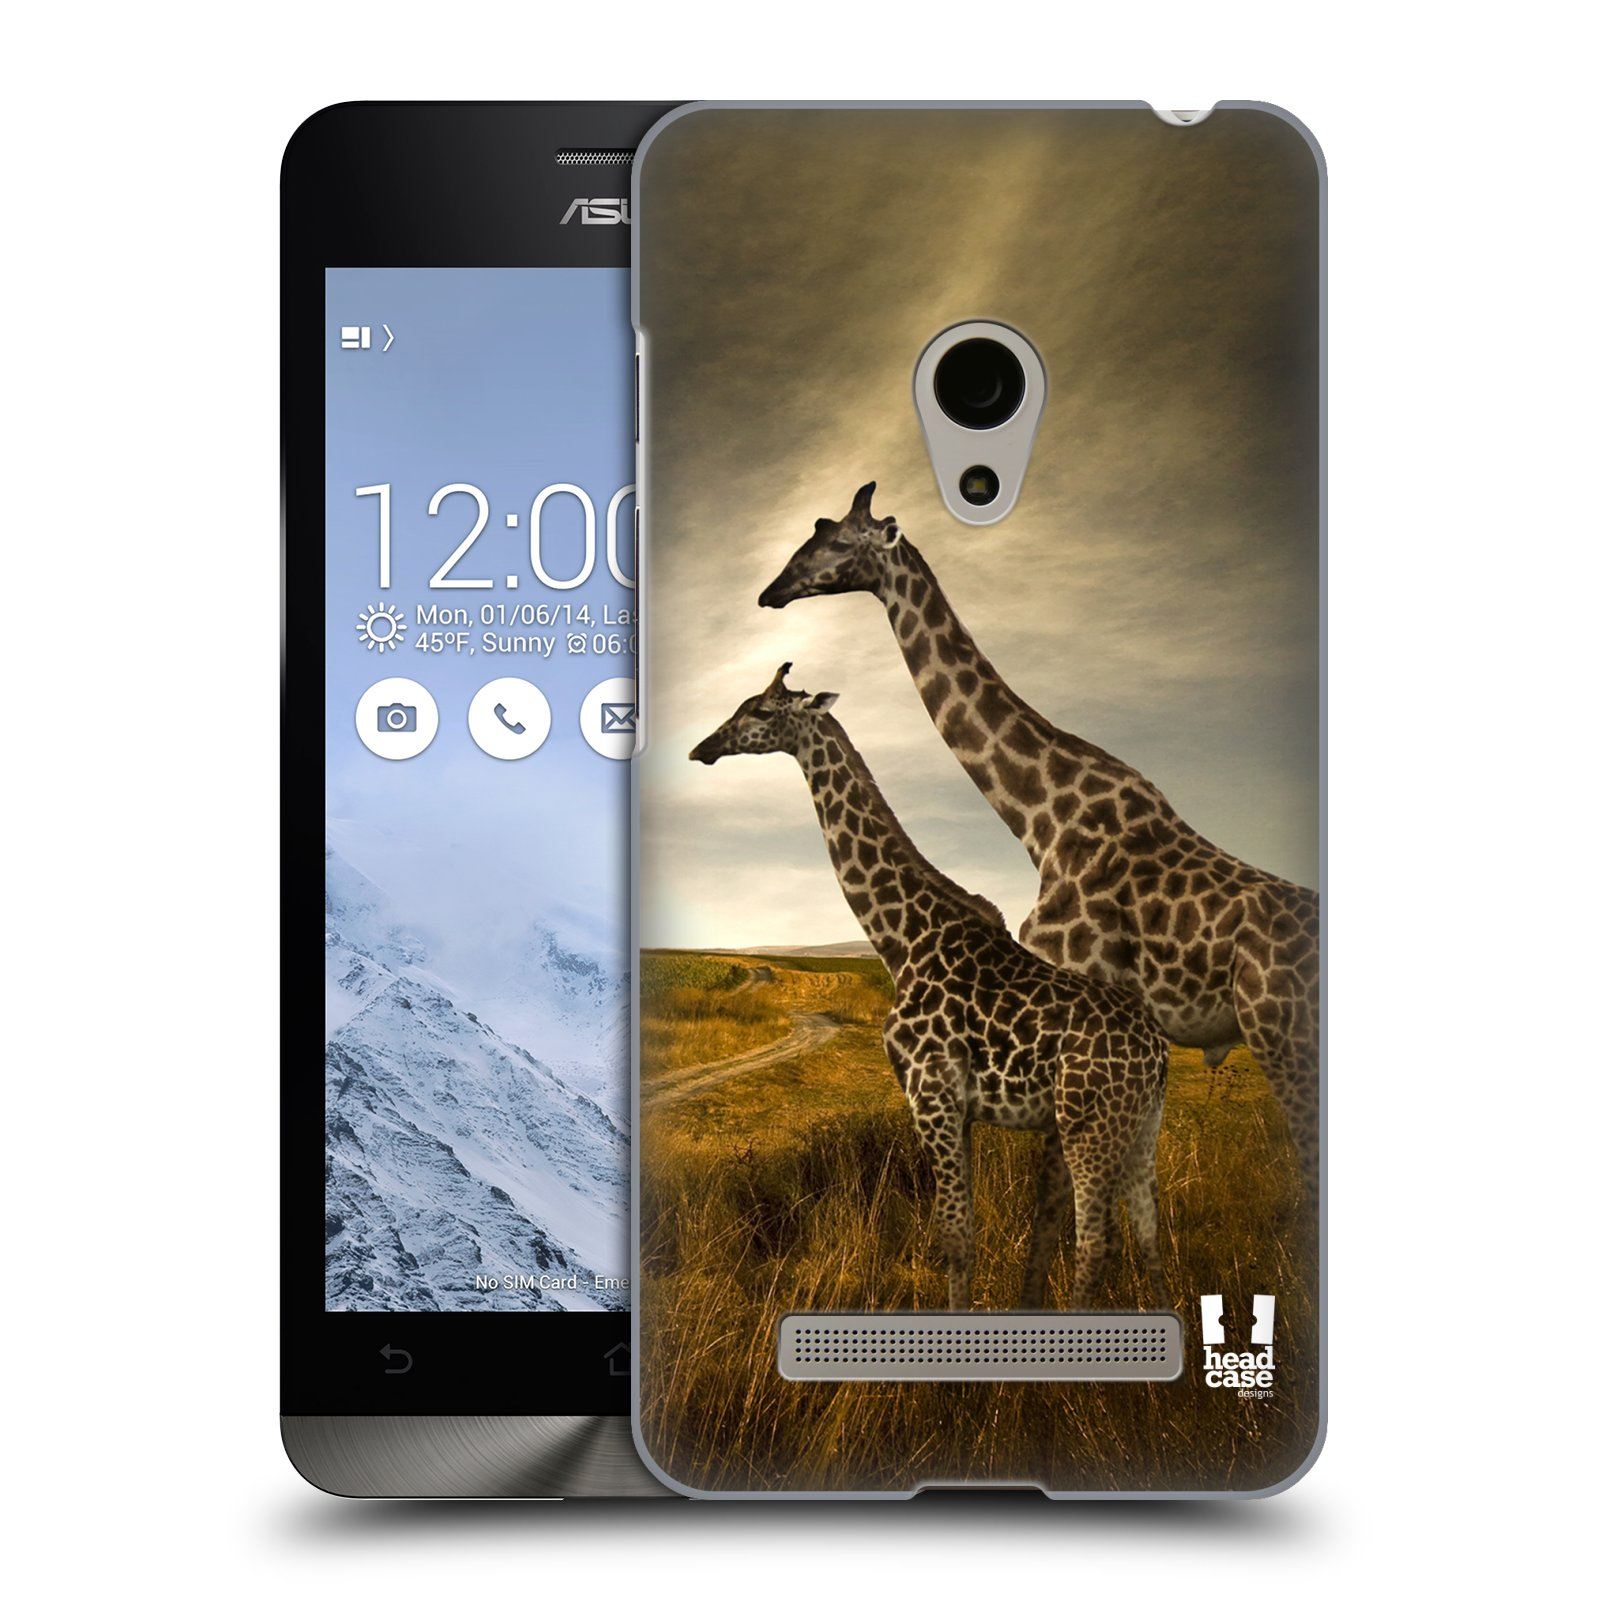 HEAD CASE plastový obal na mobil Asus Zenfone 5 vzor Divočina, Divoký život a zvířata foto AFRIKA ŽIRAFY VÝHLED